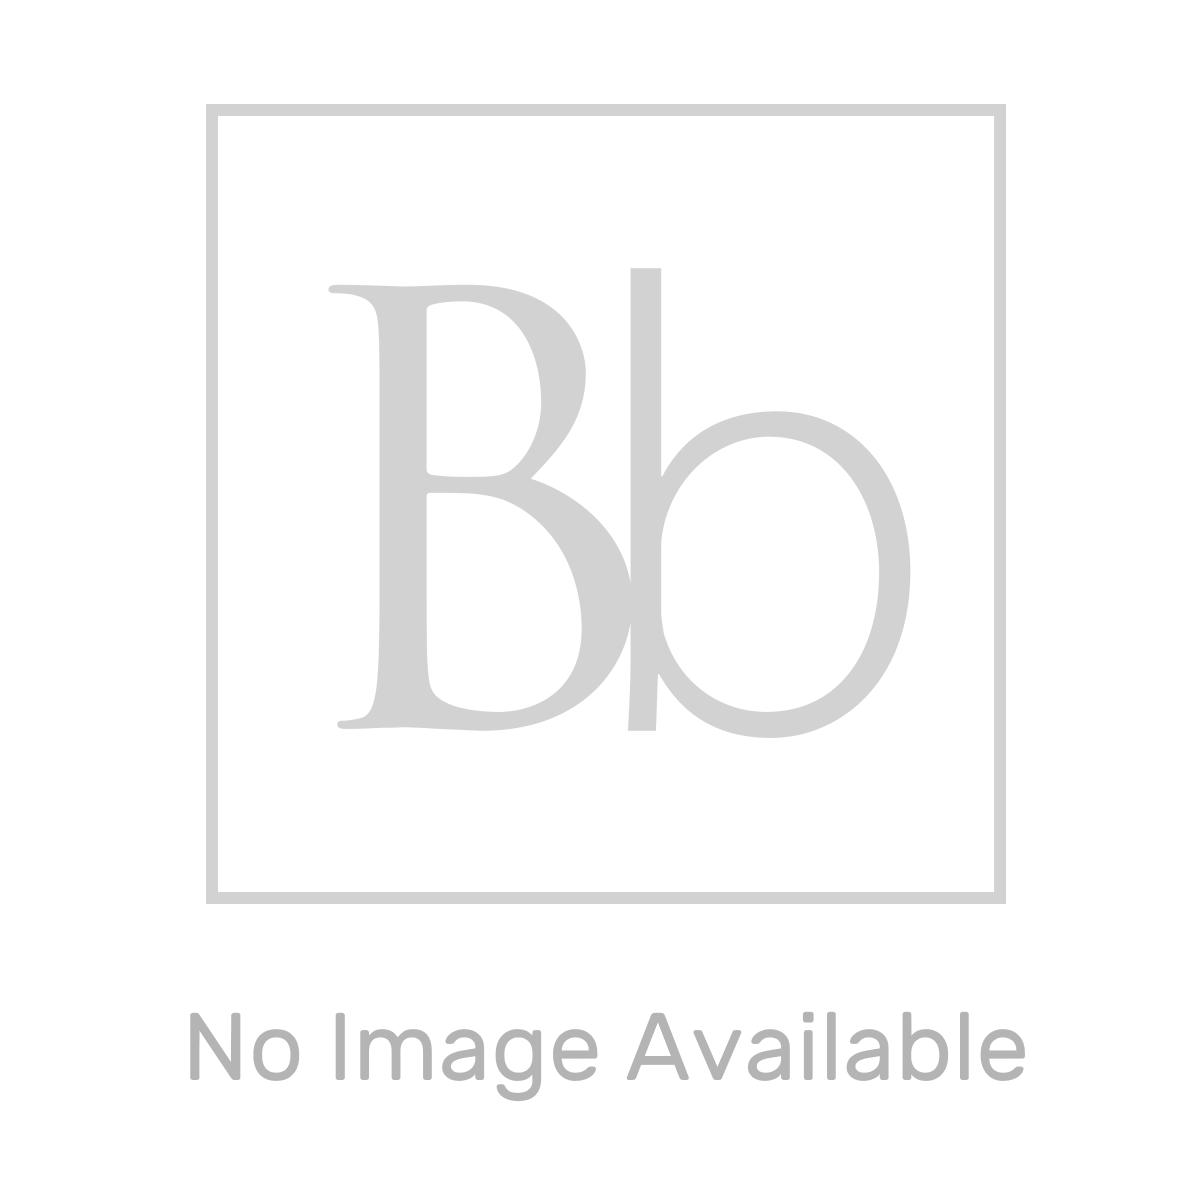 Frontline Aquaglass+ Frameless 4 Fold Bath Screen